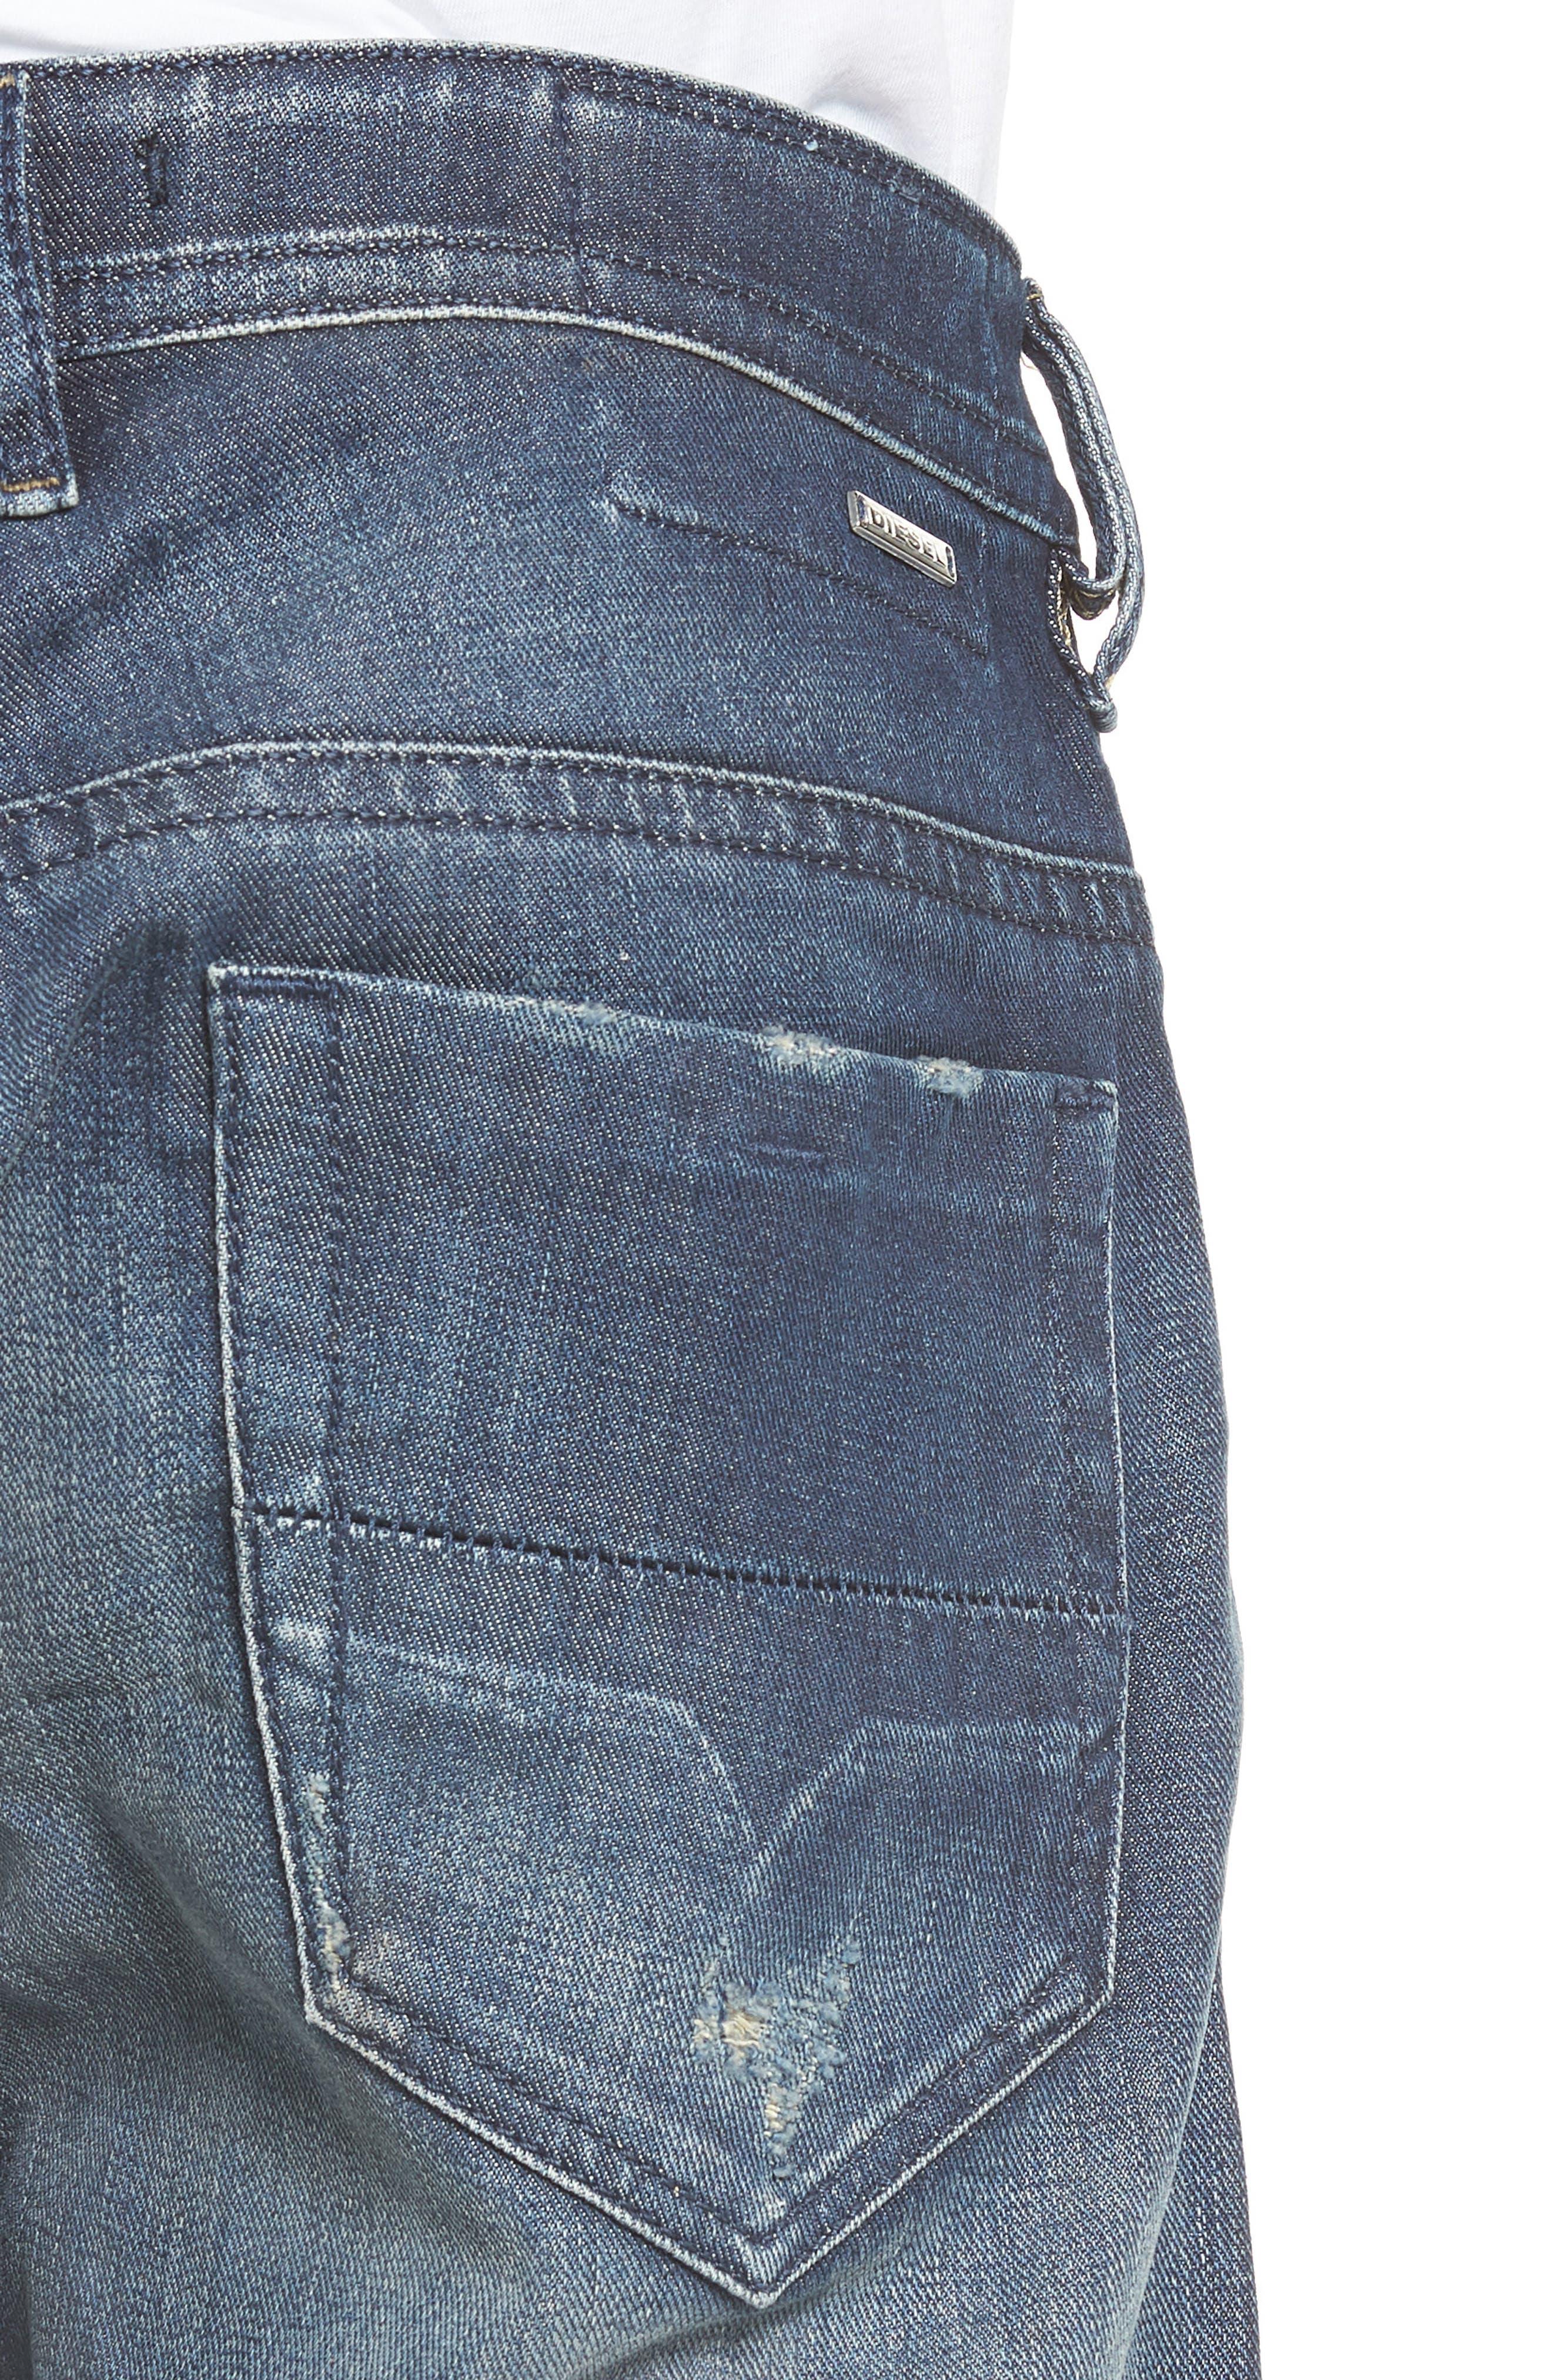 Thommer Slim Fit Jeans,                             Alternate thumbnail 4, color,                             Denim